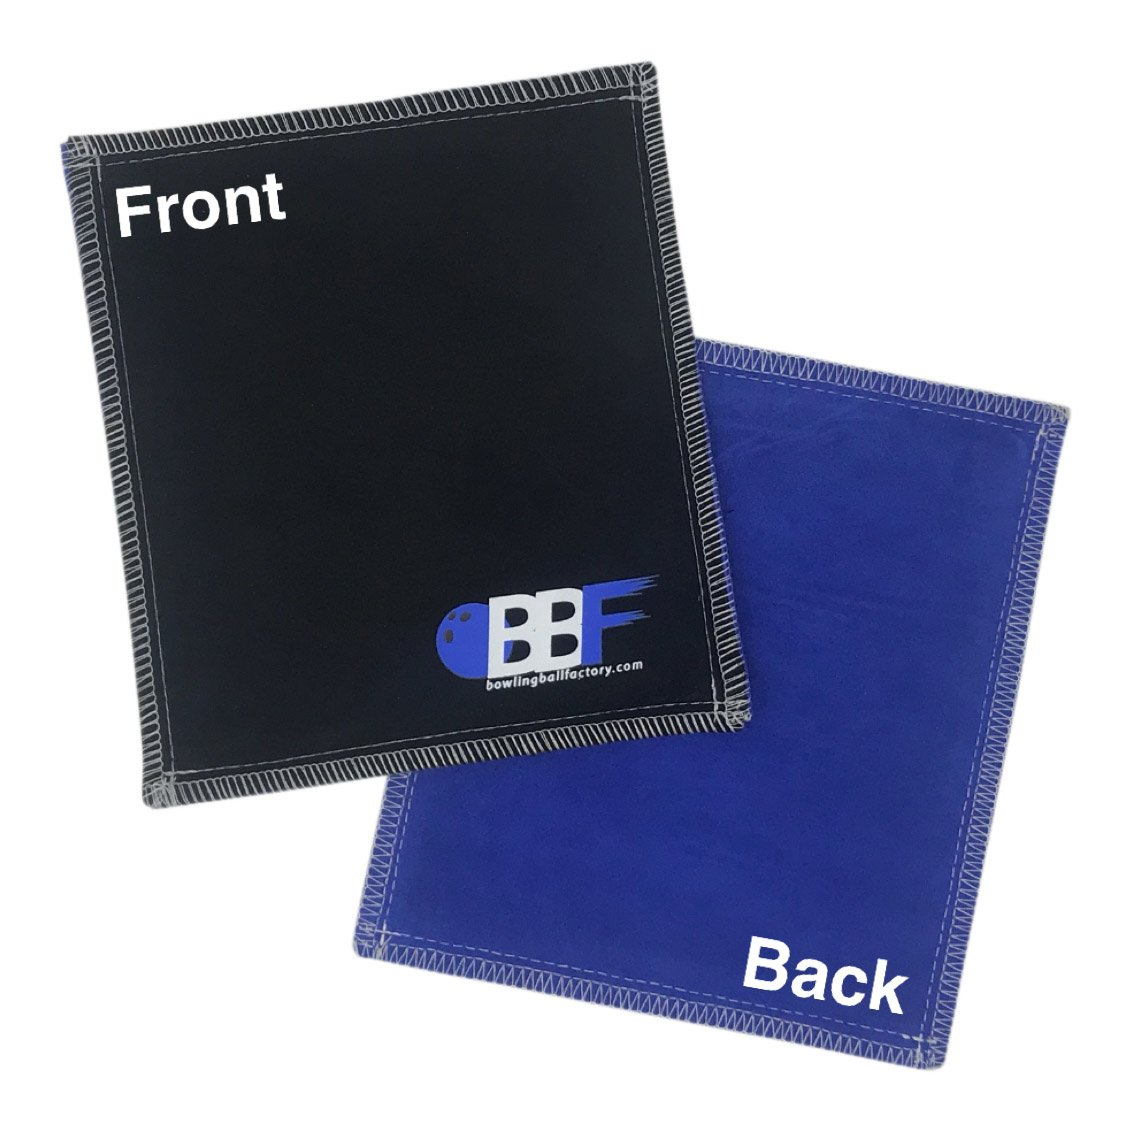 bowlingballfactory.com Royal/Black Ultra Tac Double Sided Black Leather Bowling Ball Shammy Pad Towel